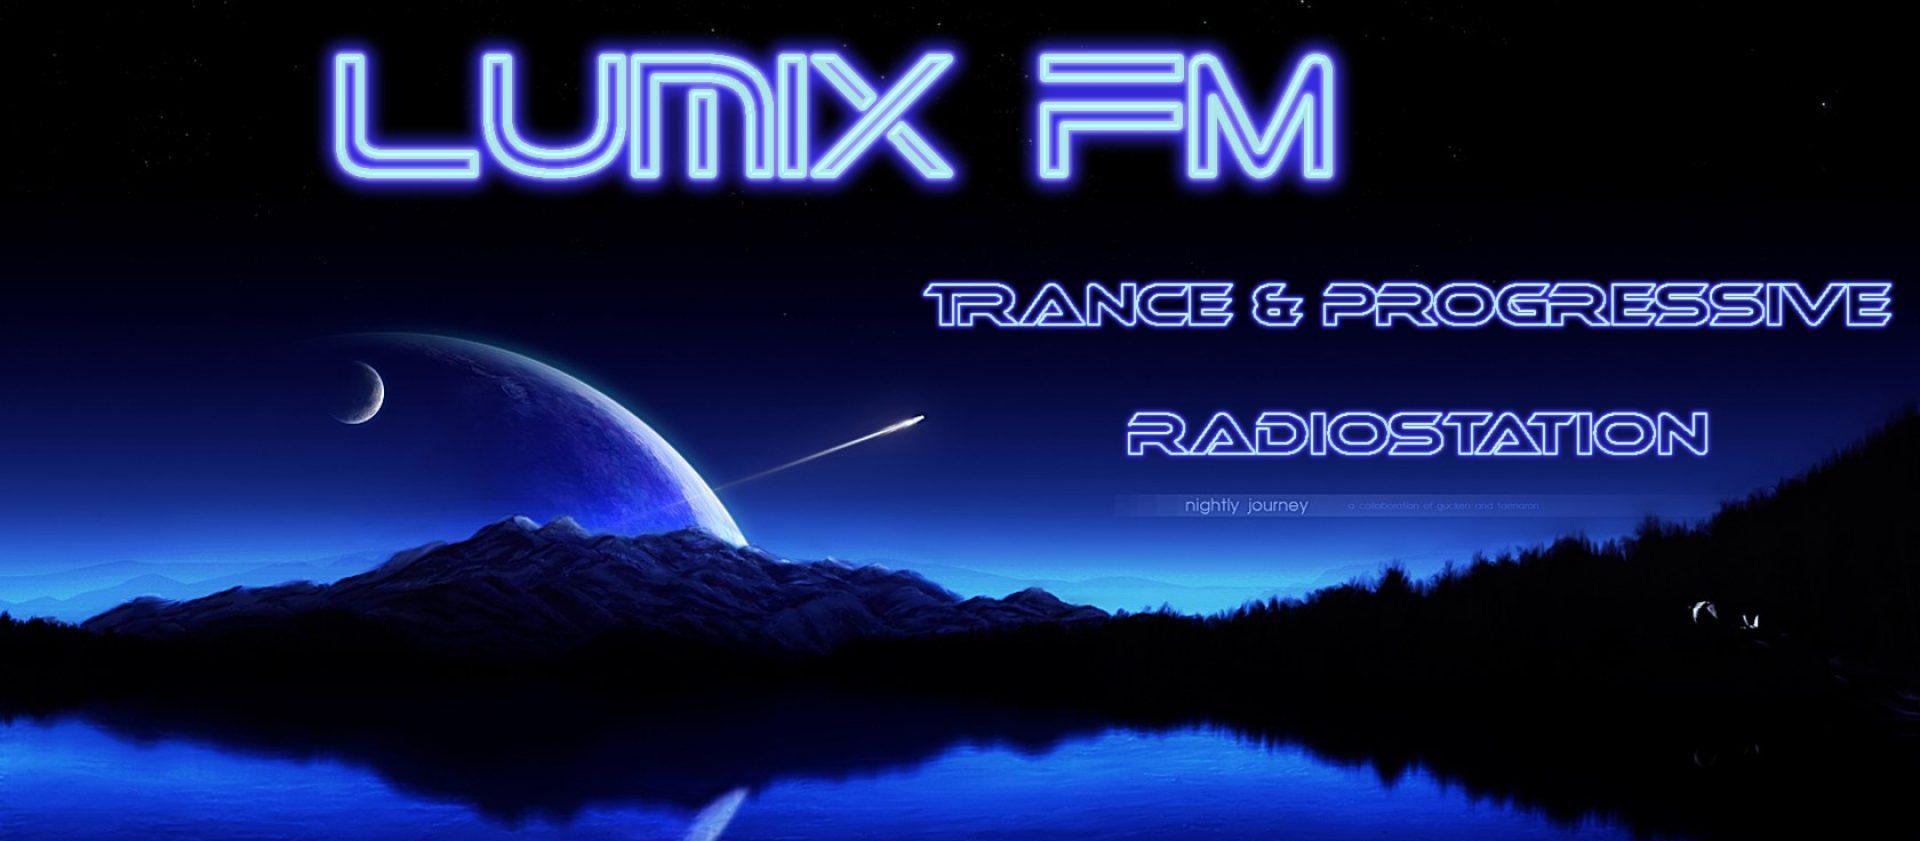 Lumix FM Radiostation